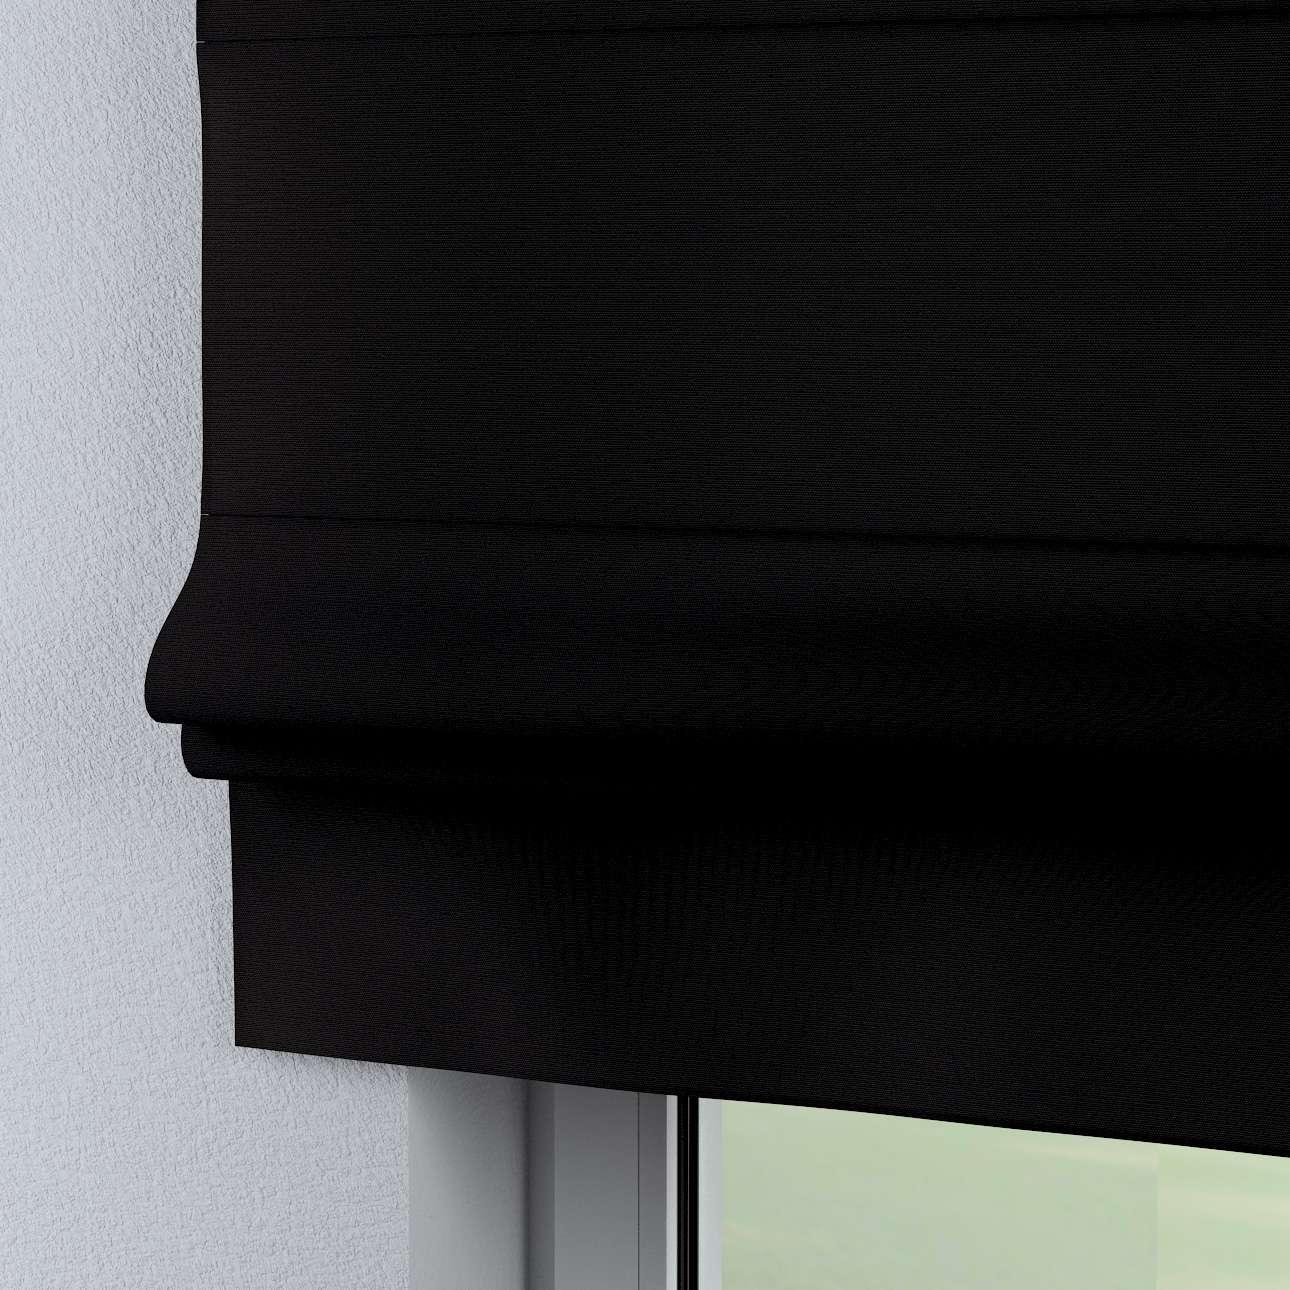 Raffrollo Padva 80 x 170 cm von der Kollektion Cotton Panama, Stoff: 702-08